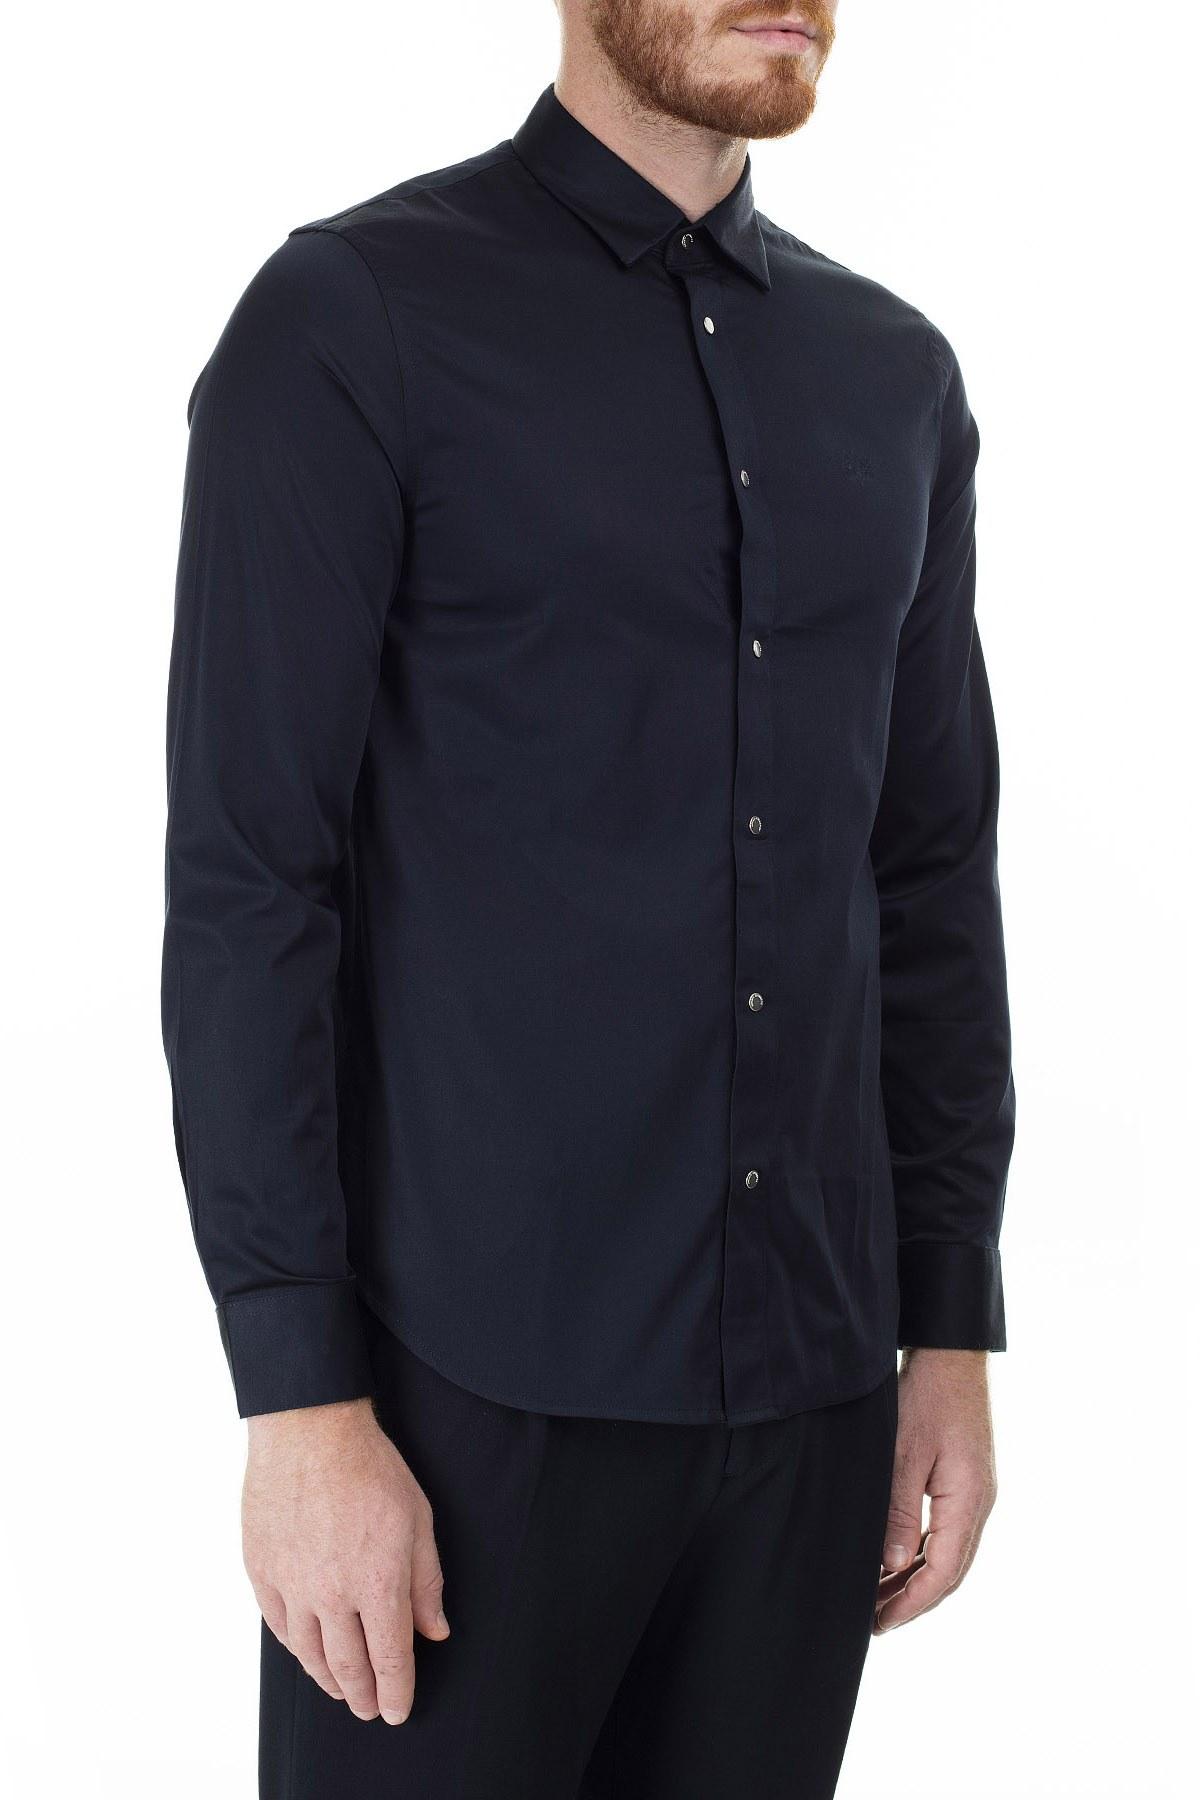 Armani Exchange Slim Fit Uzun Kollu Erkek Gömlek 8NZC13 ZN10Z 1510 LACİVERT